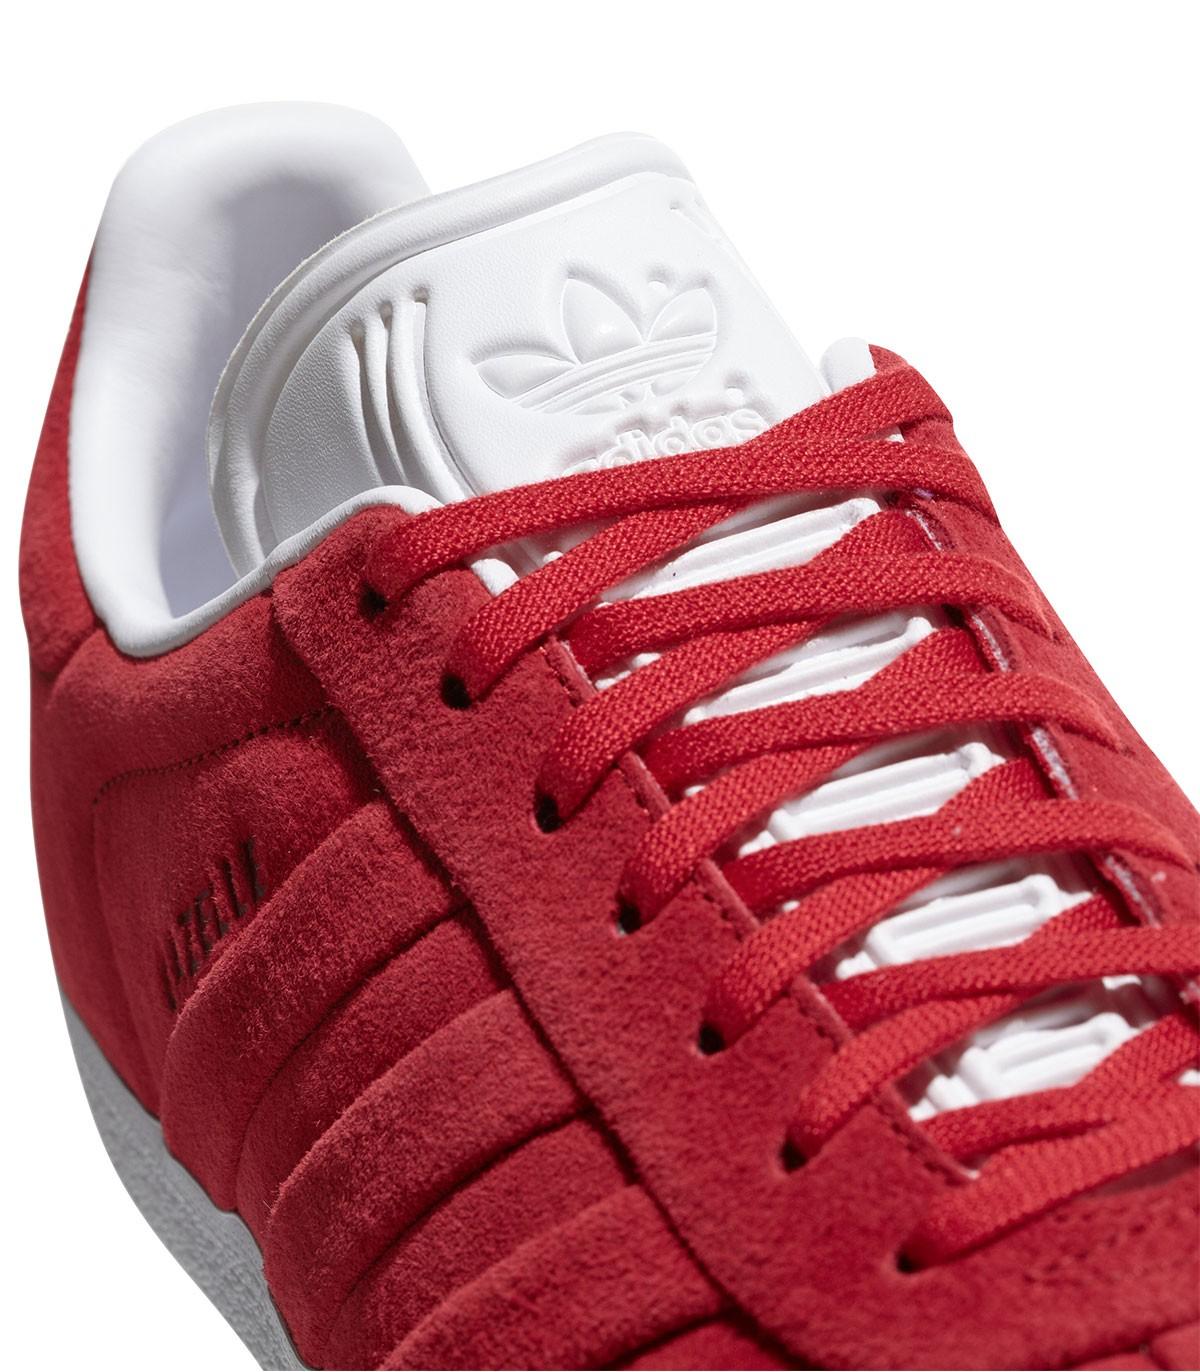 Adidas Turn Rouge Buy Gazelle Stitch And b7IYyf6gv